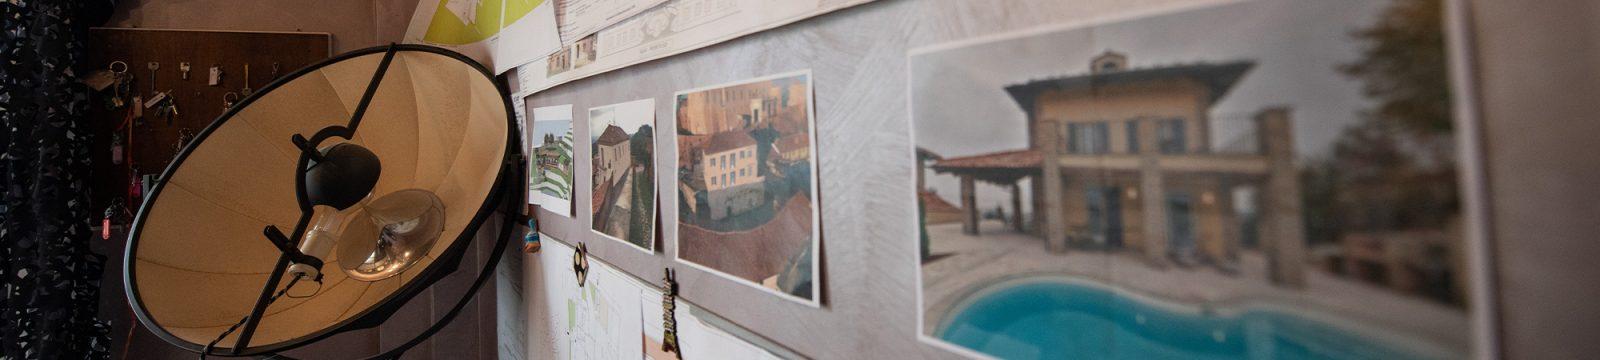 Studio Anna Cane | Referenze